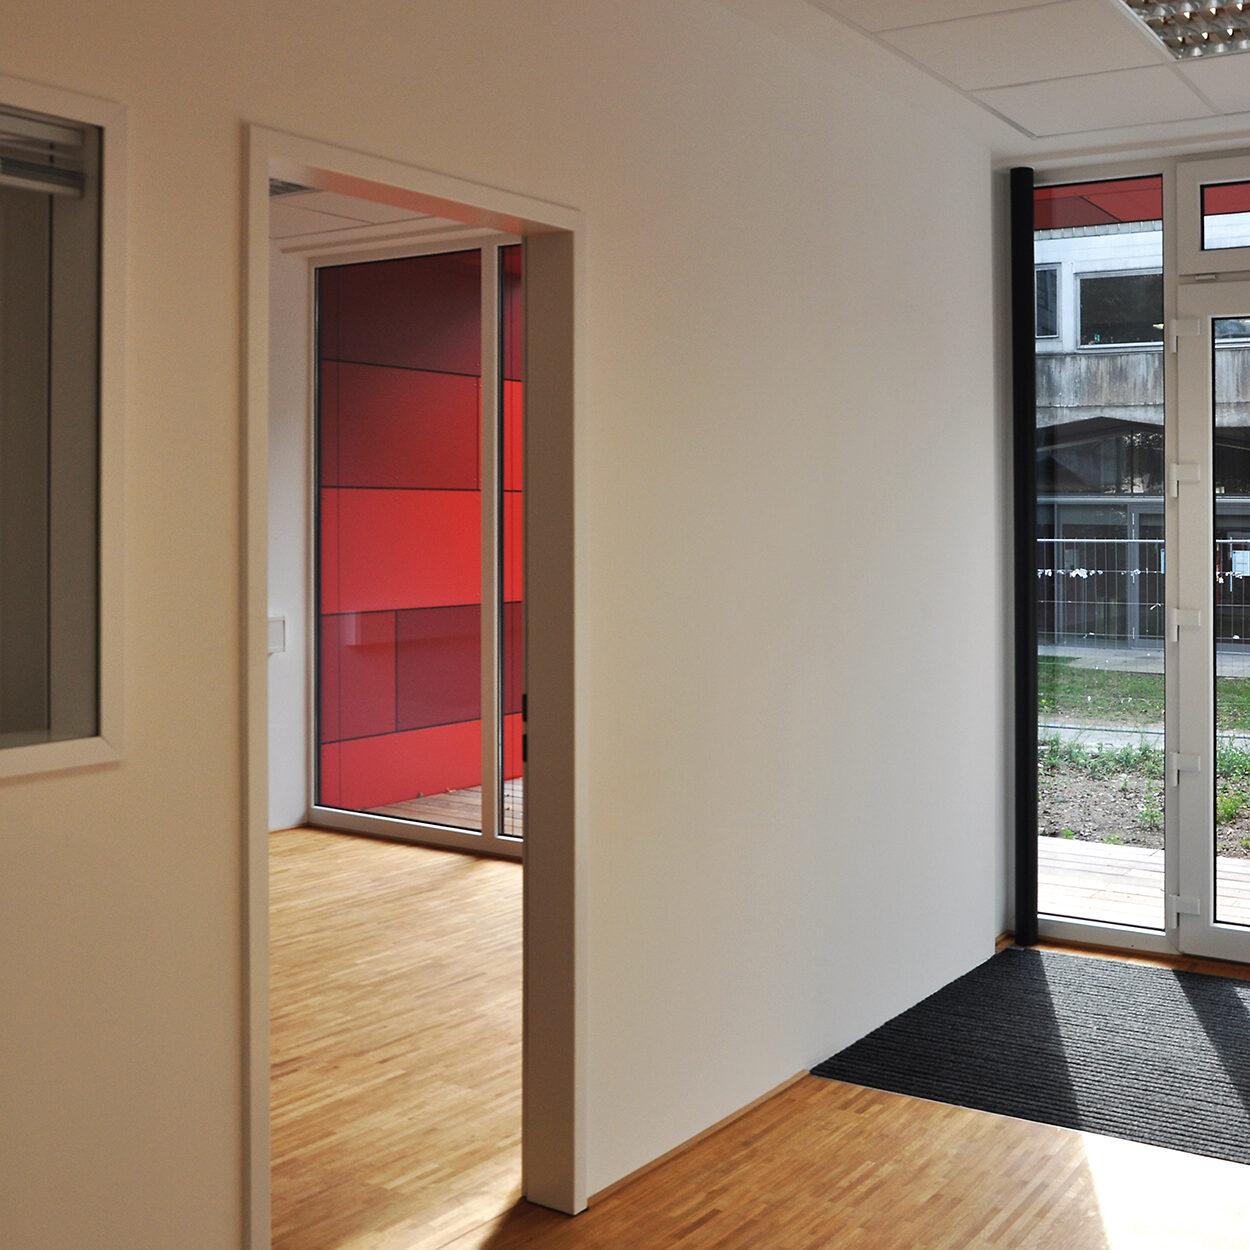 AMM_Architekturbuero_Markus_Mueller020